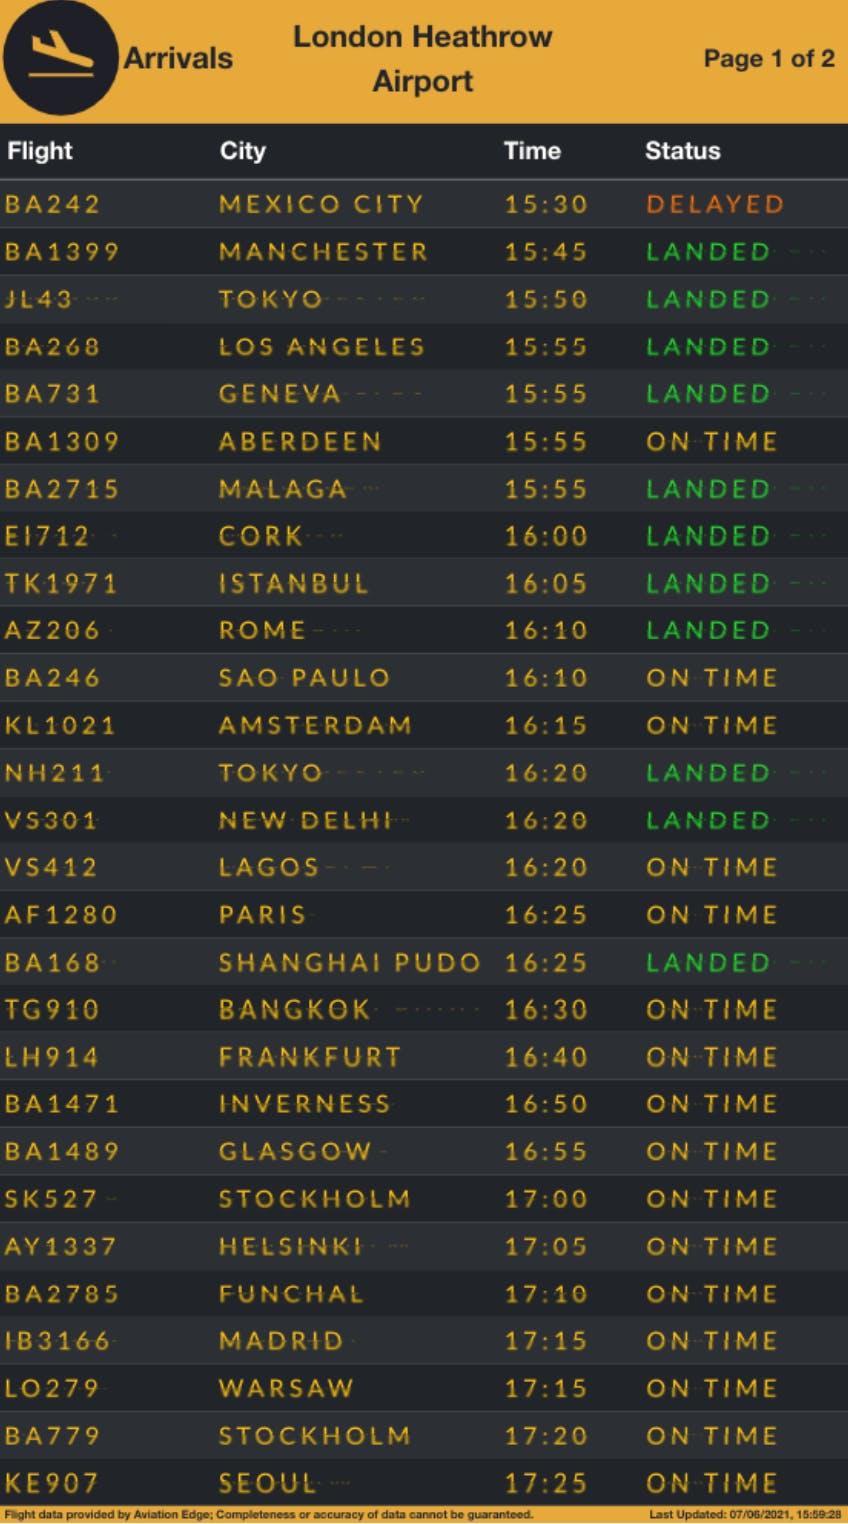 ScreenCloud Flight Schedule App - Portait mode disclaimer 6.10.2021.png